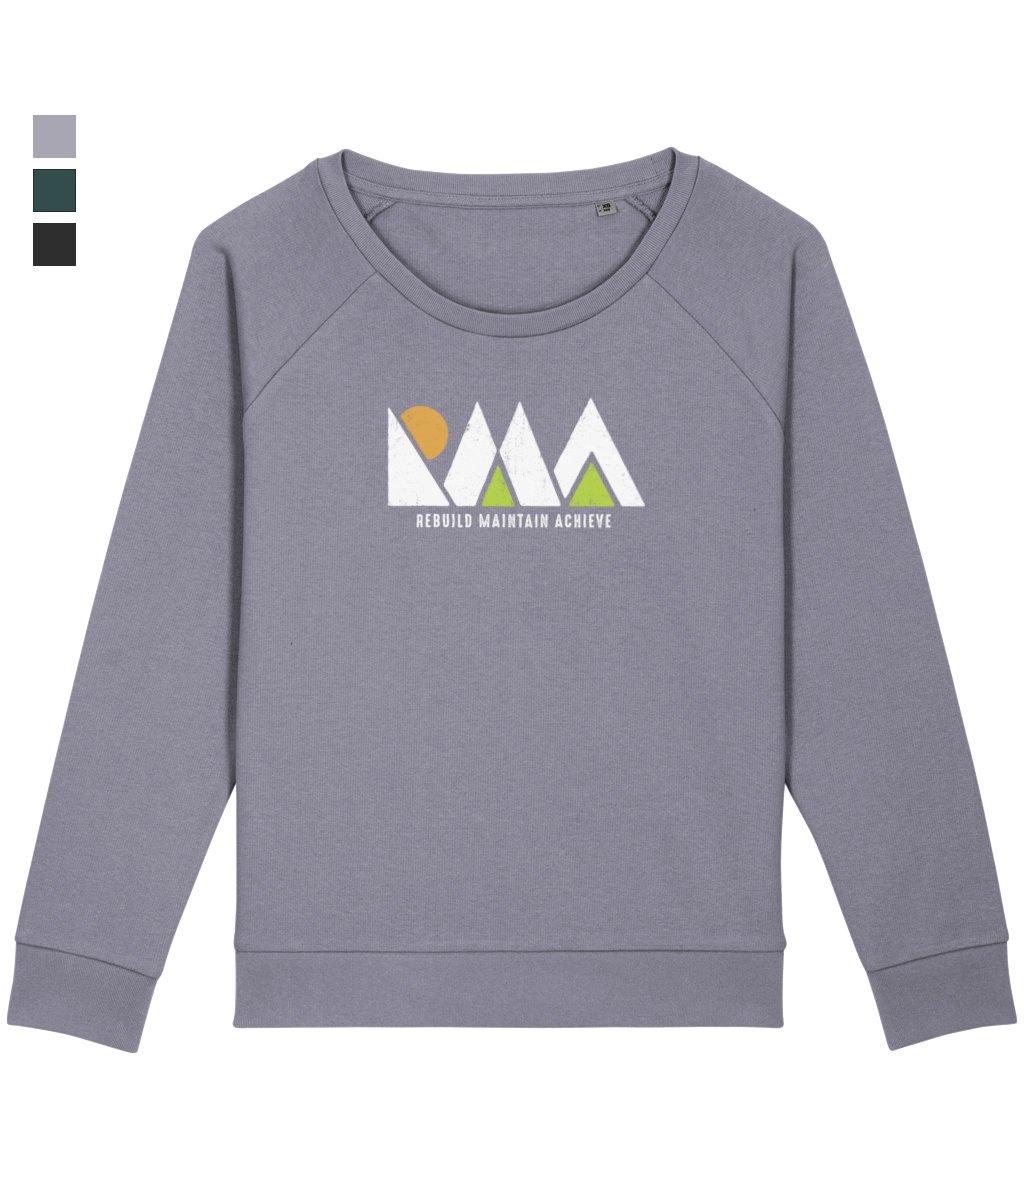 Image of Women's Sweatshirt